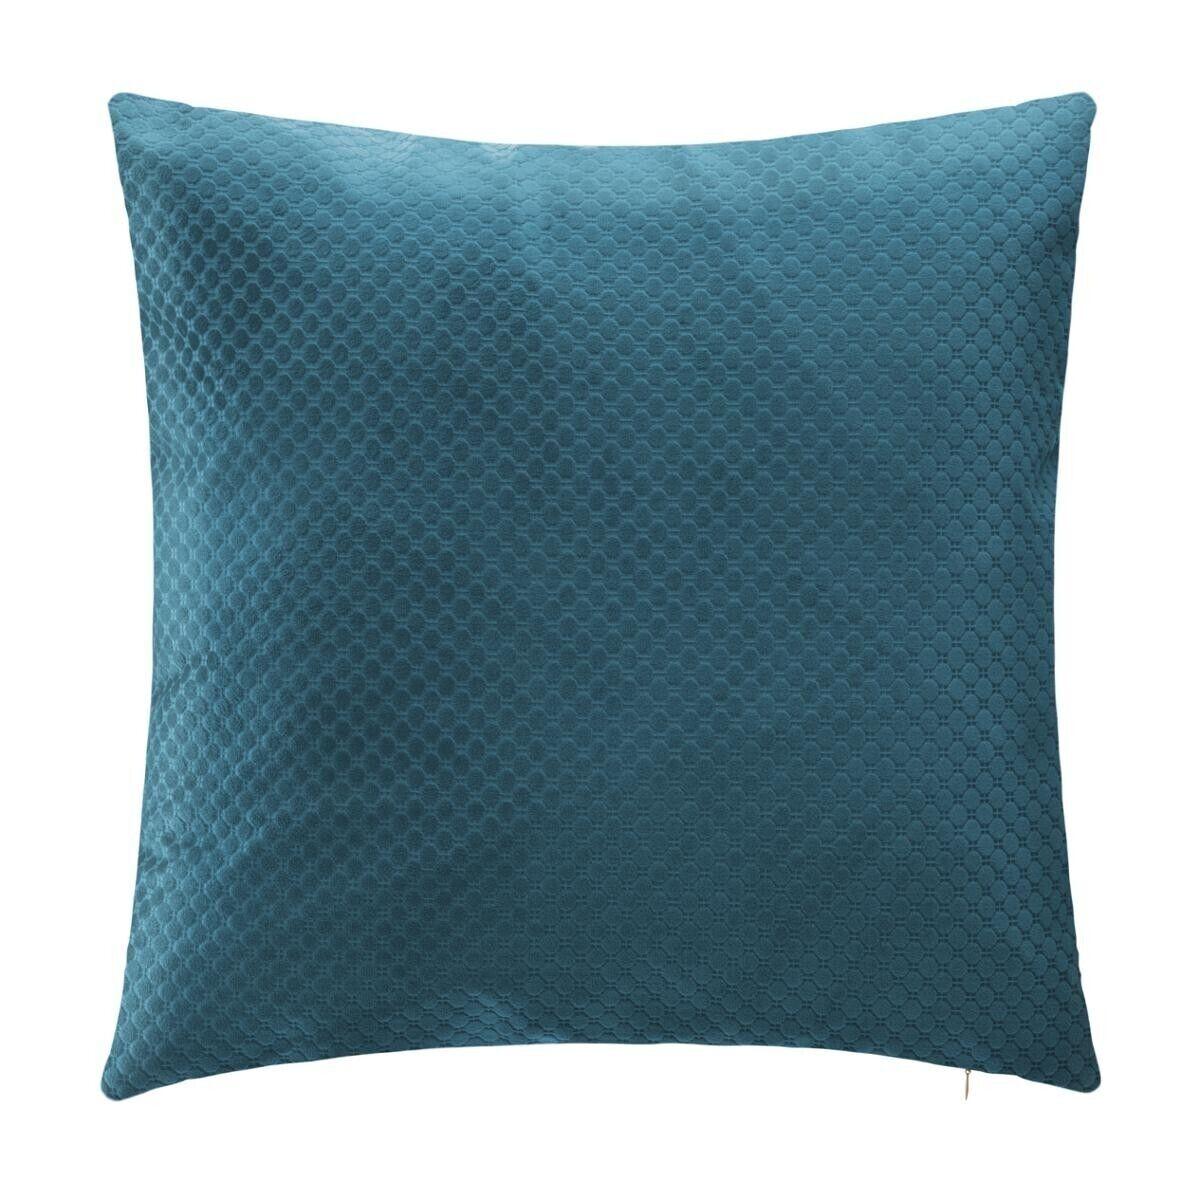 Atmosphera Coussin 'Bulle' en velours bleu 45x45 cm old_refs-2021_DTE Unisexe